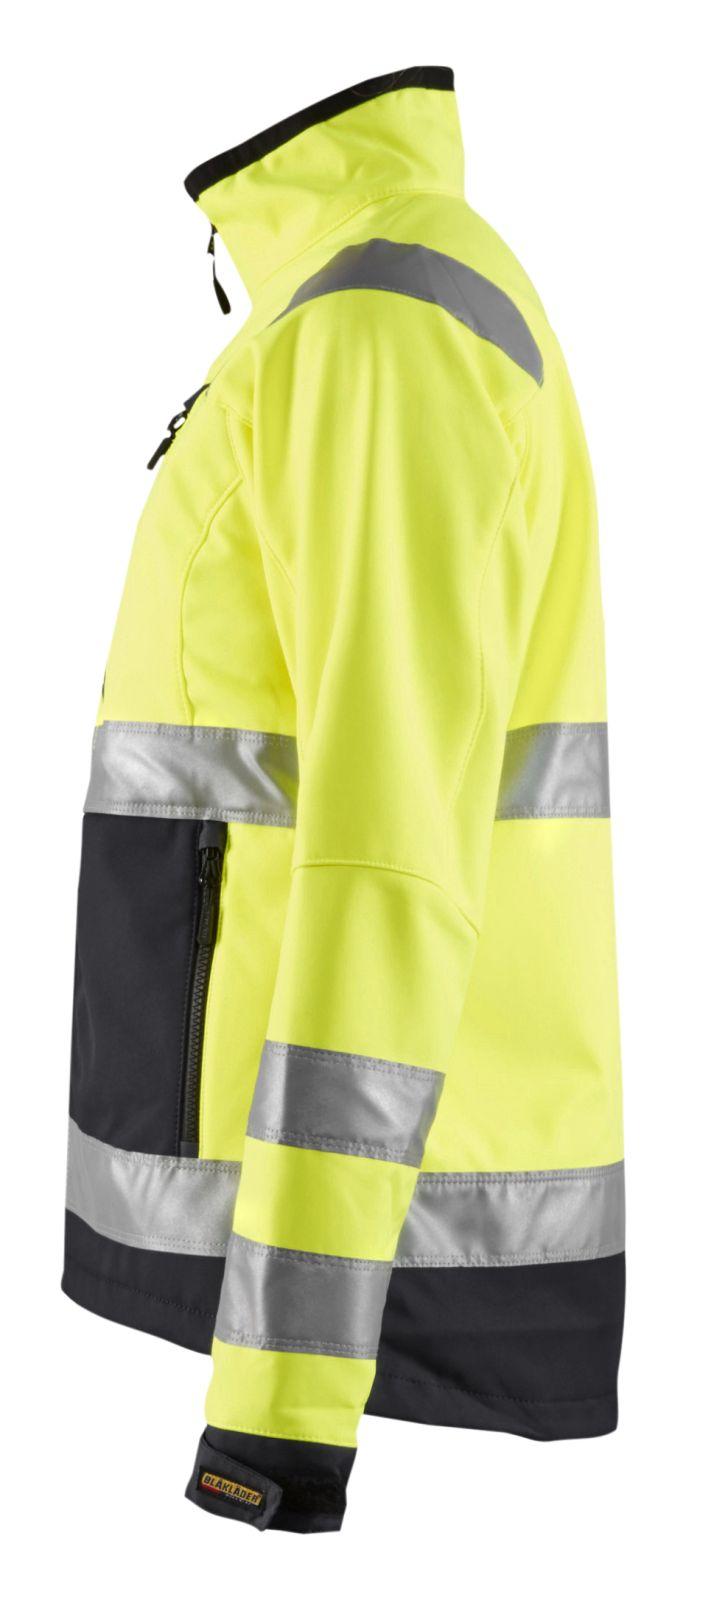 Blaklader Dames softshell jacks 49022517 High Vis geel-zwart(3399)